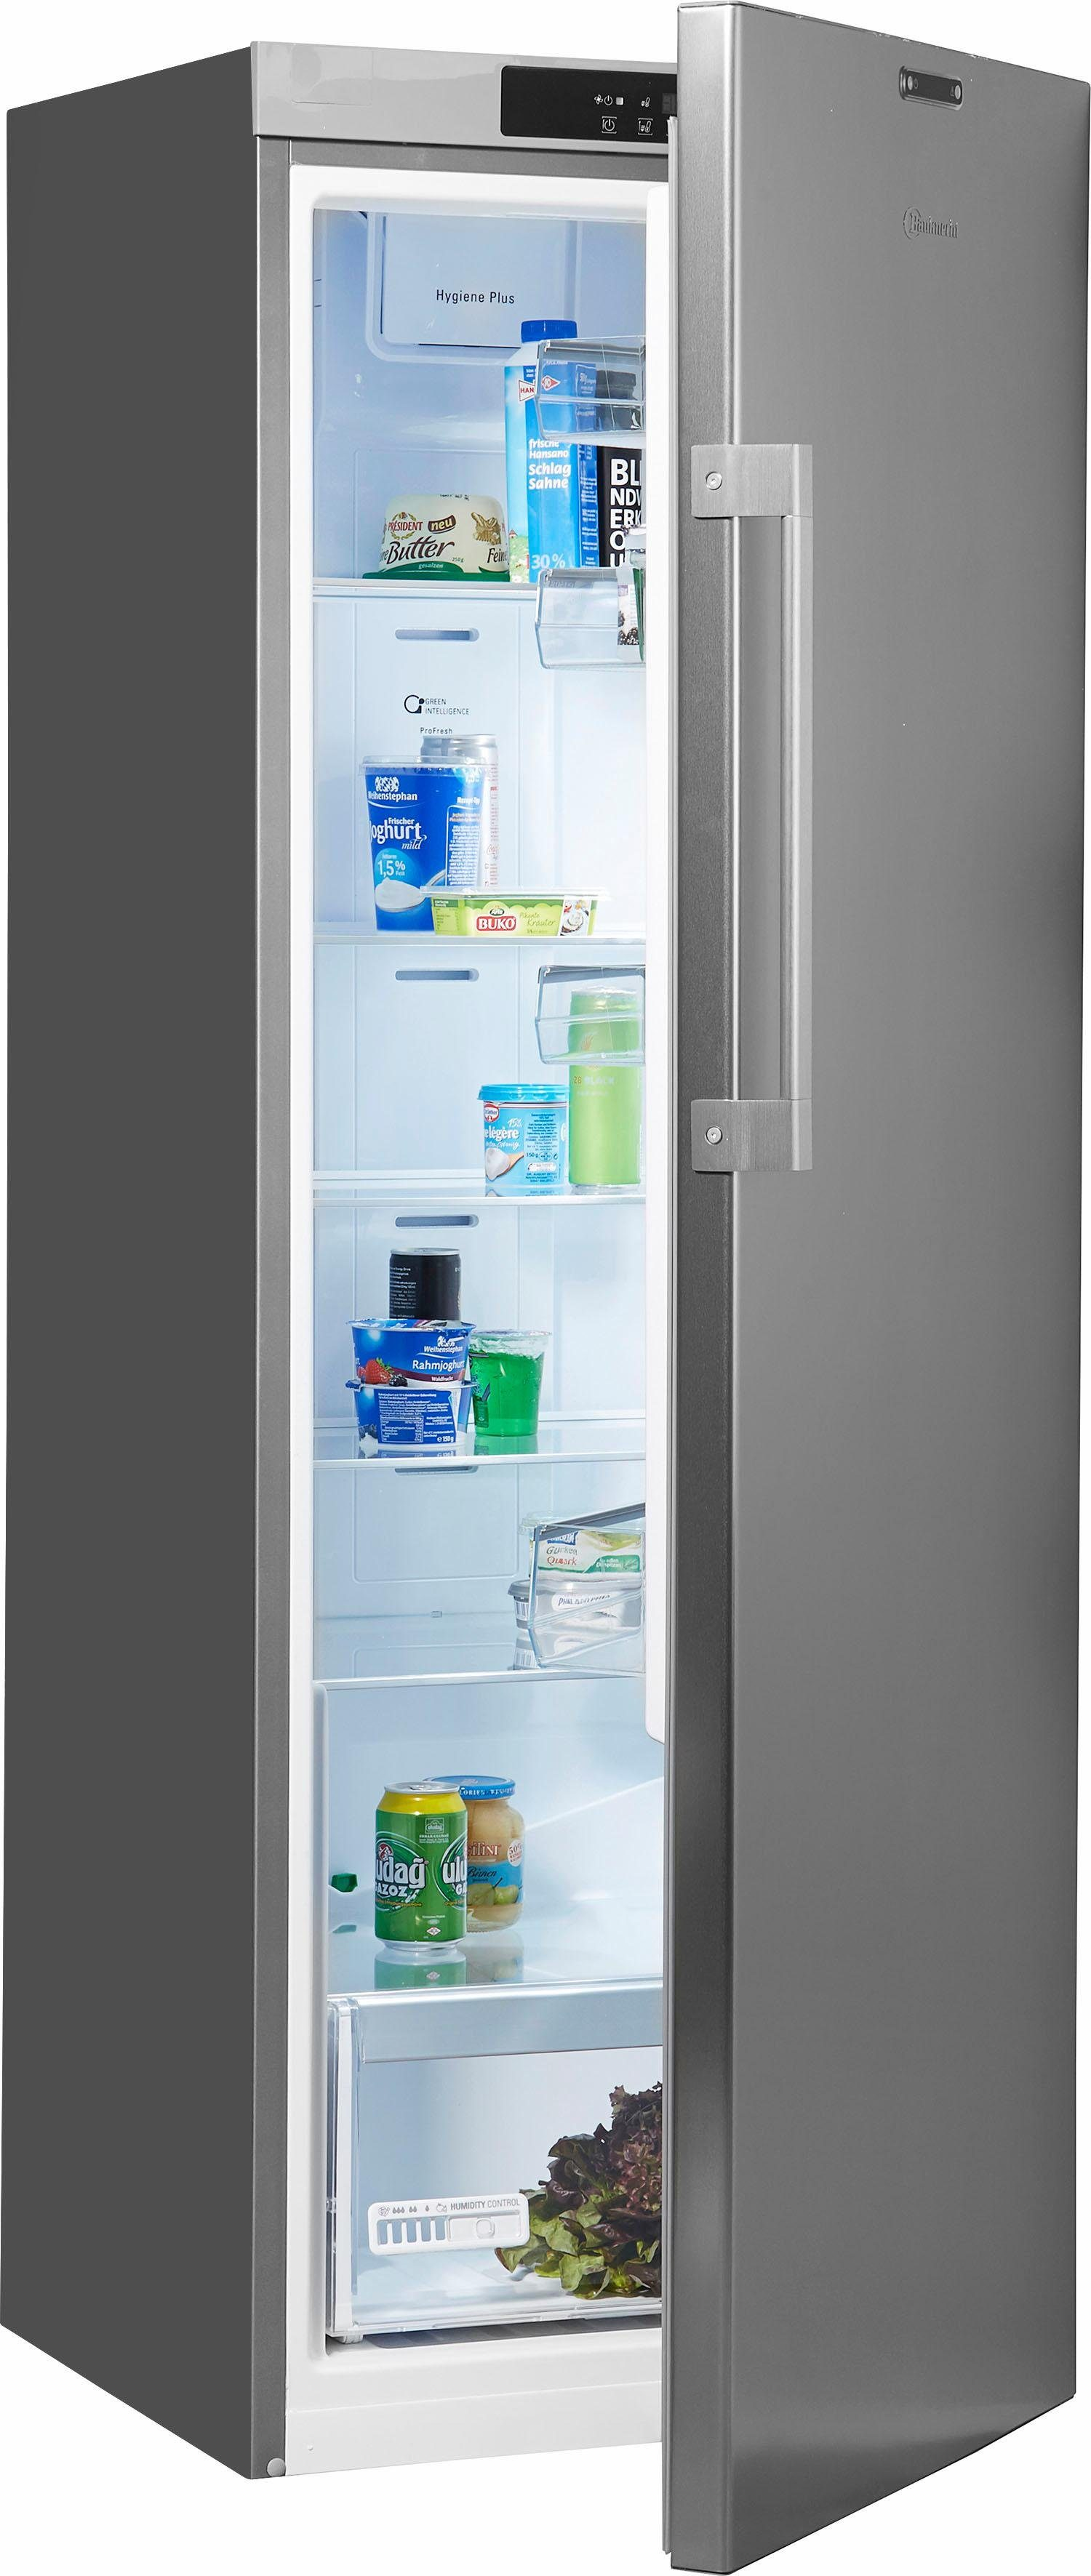 BAUKNECHT Kühlschrank KR 17G3 A2+ IN, 167 cm hoch, 59,5 cm breit